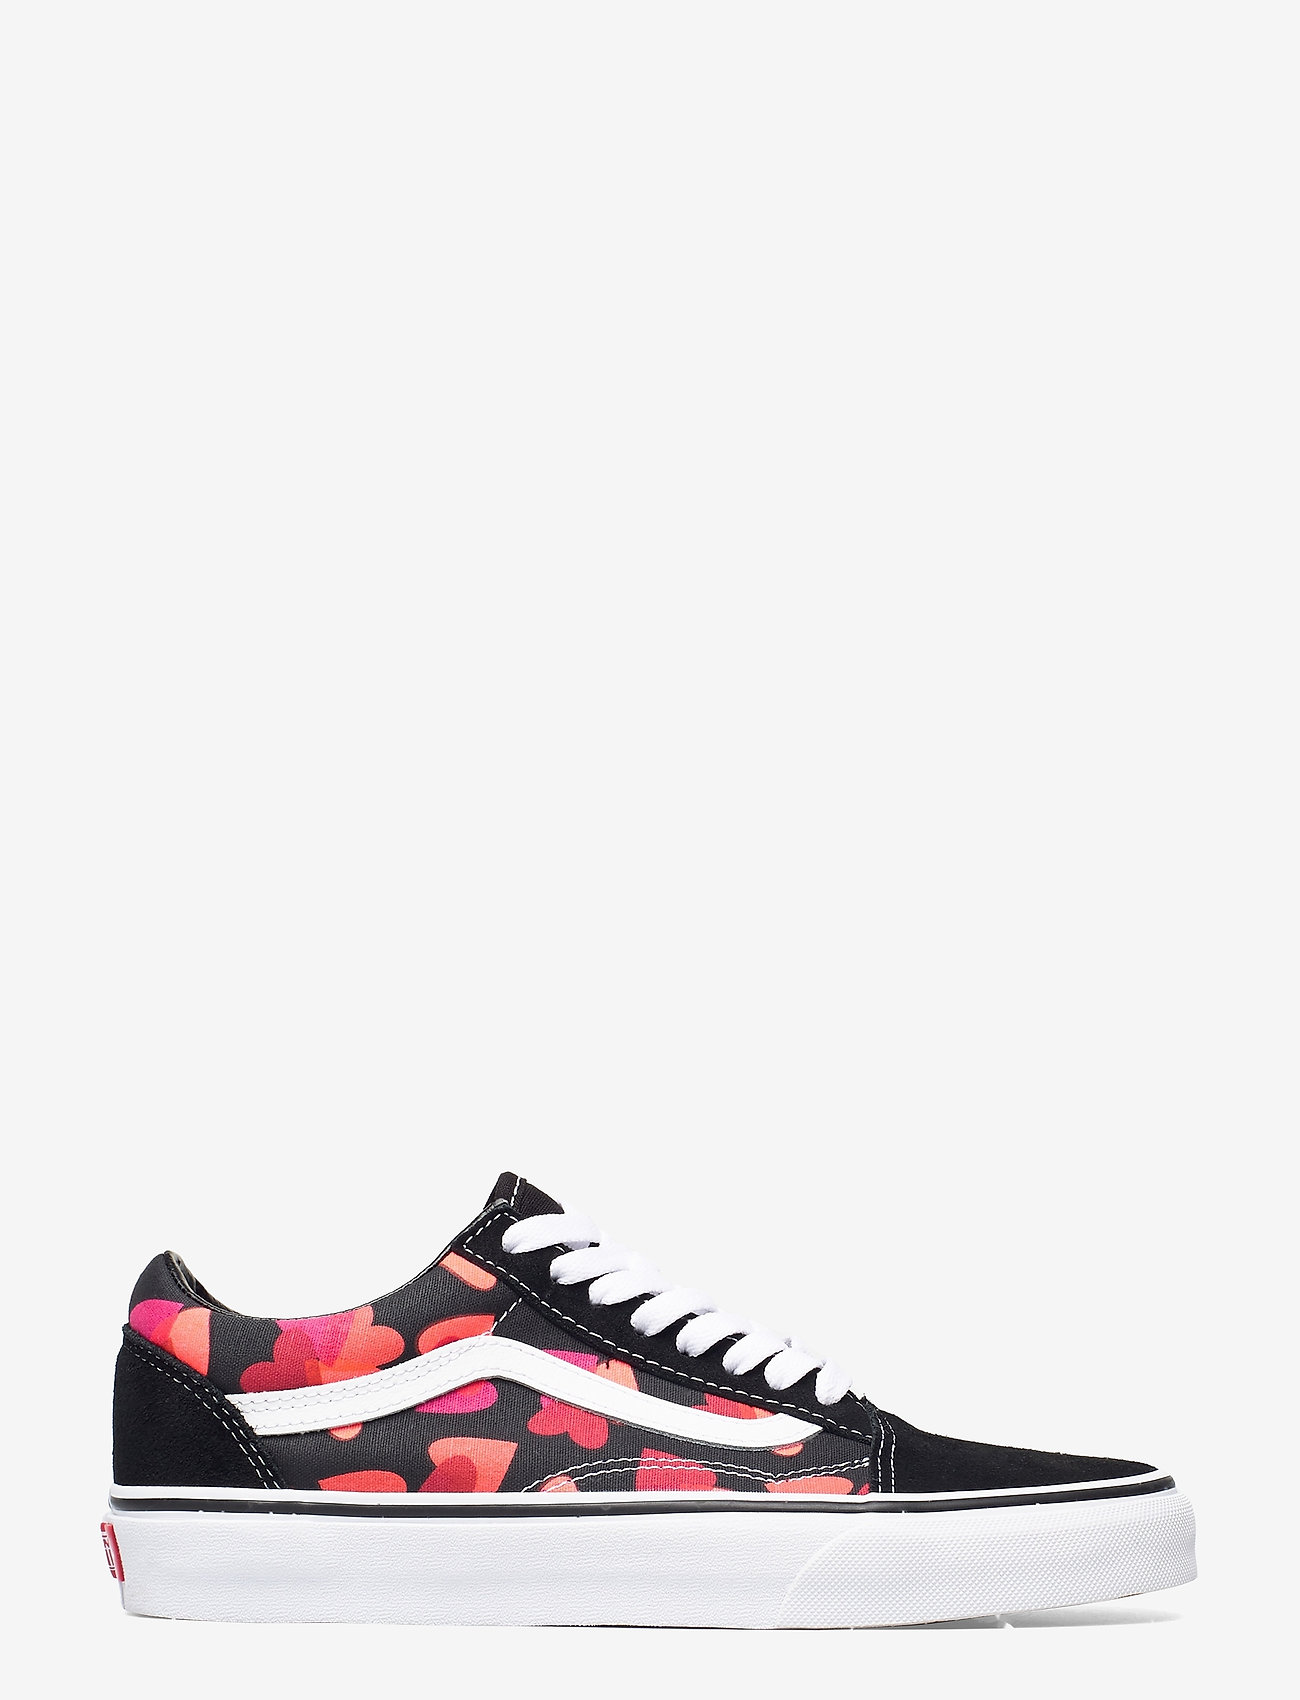 VANS - UA Old Skool - lave sneakers - (valentneshrts)blkfchsprp - 1